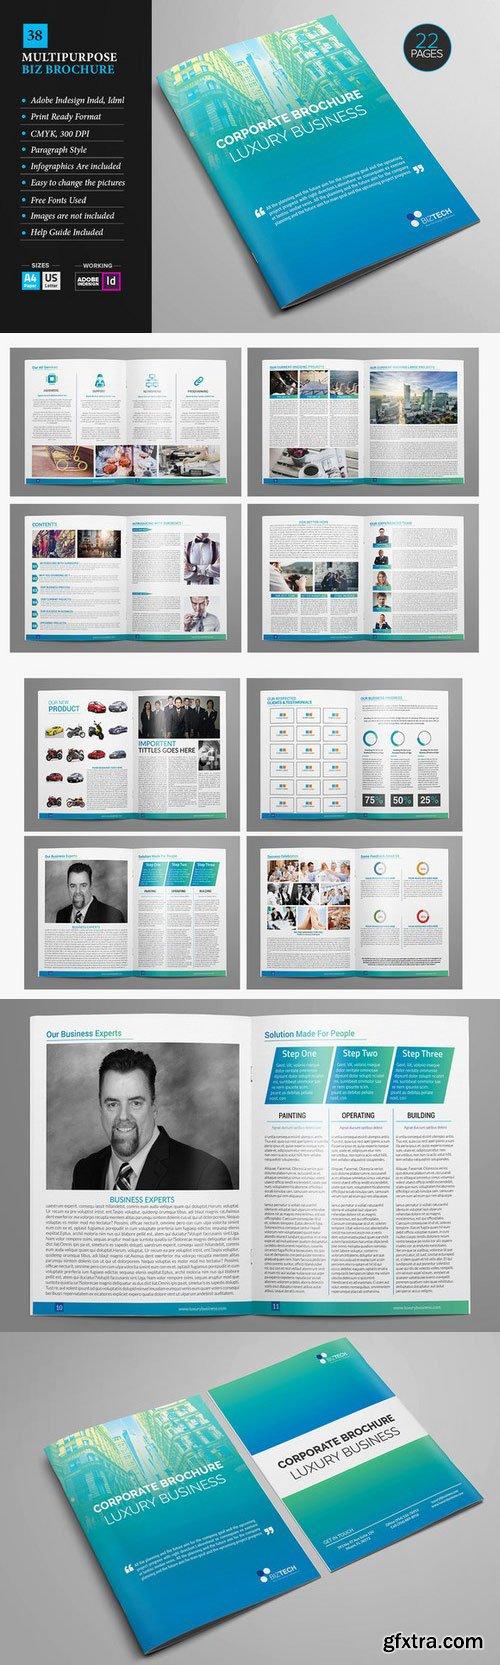 CM - Multipurpose Business Brochure 38 753235